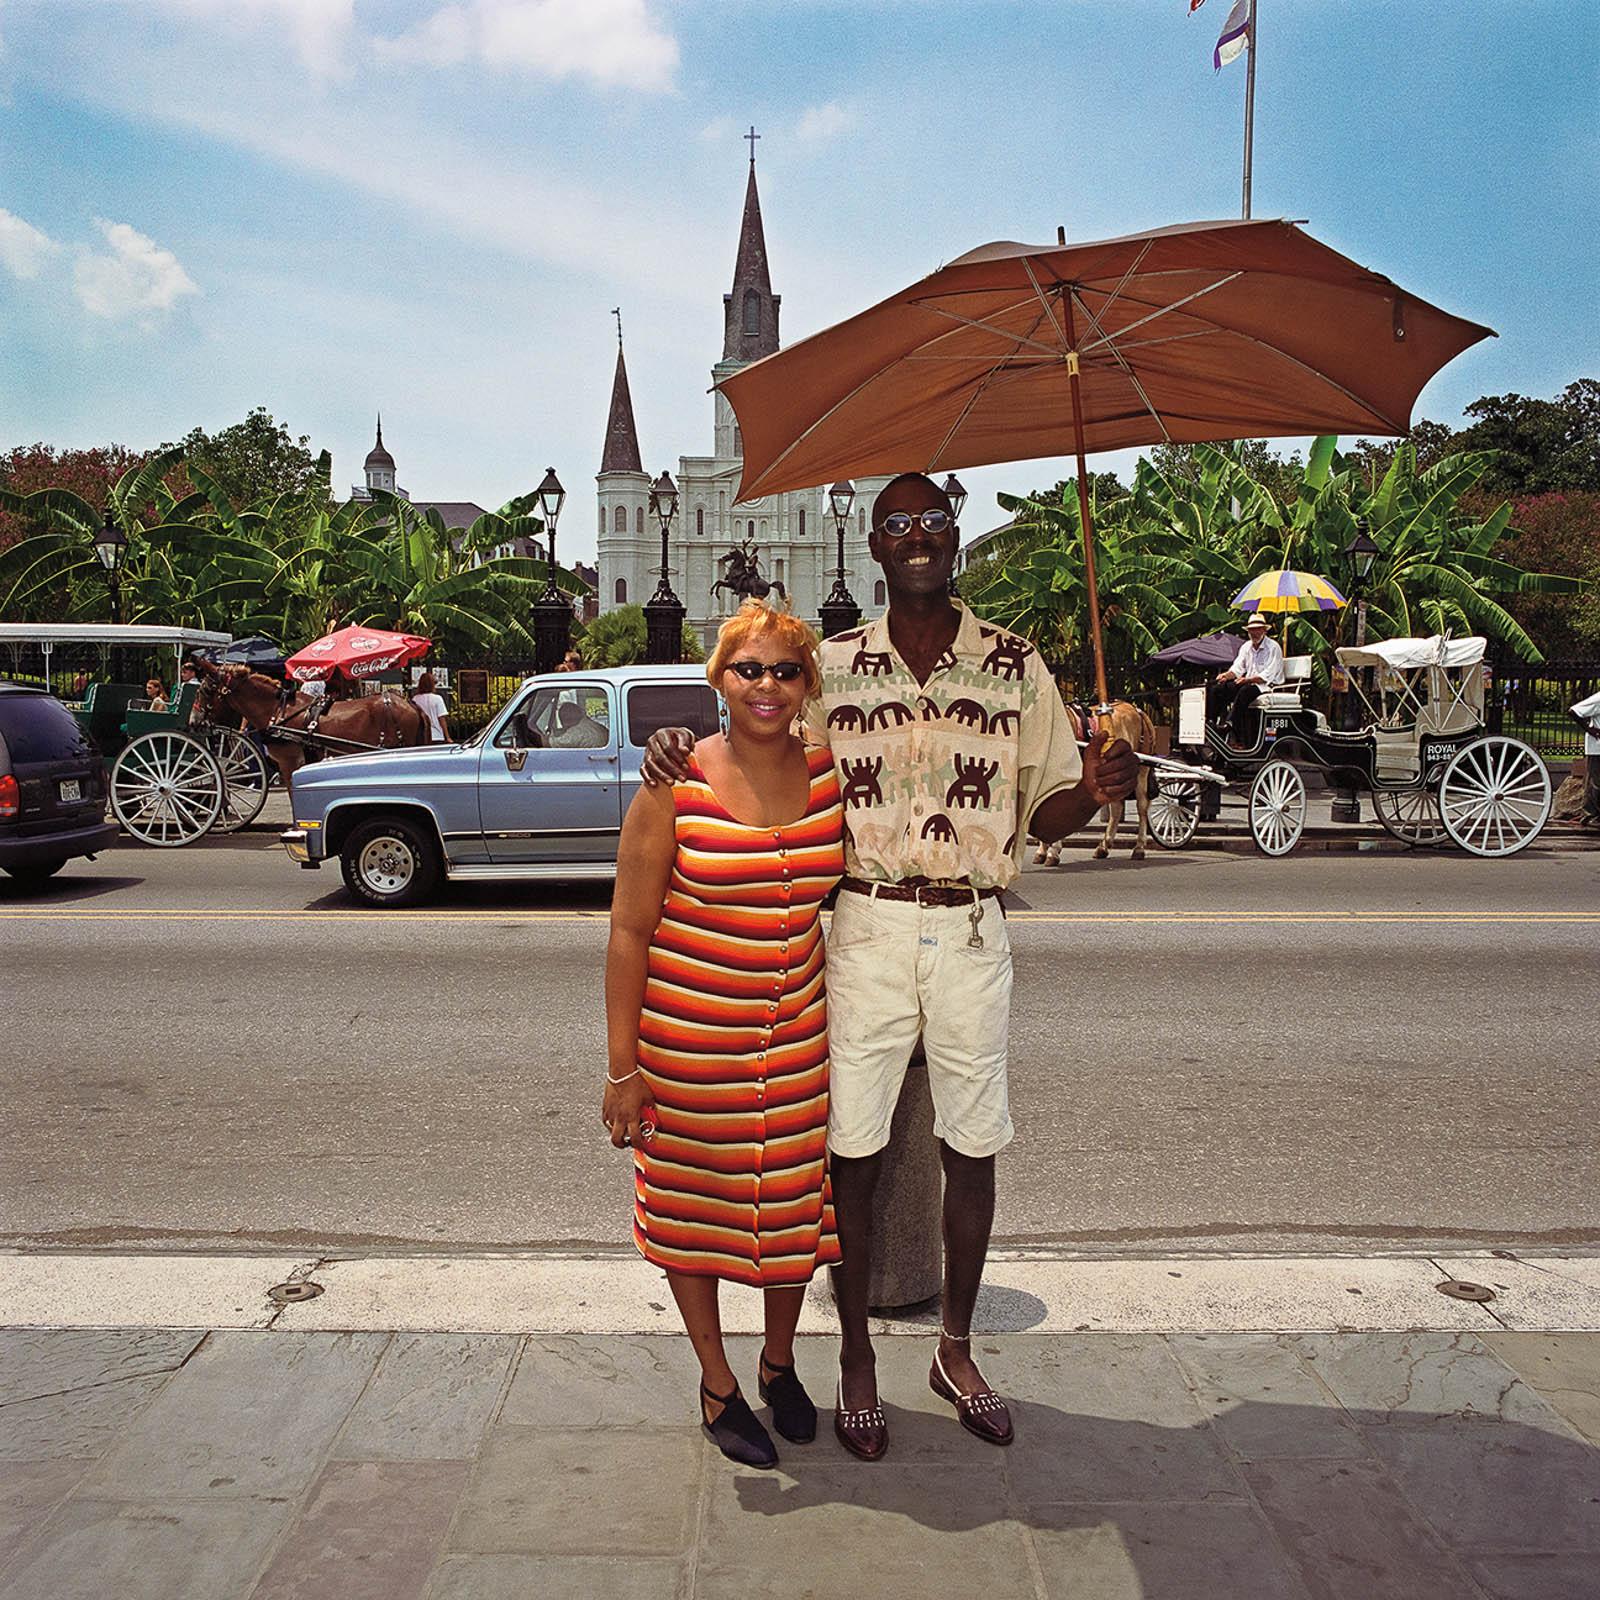 Couple at Jackson Square, New Orleans, Louisiana 2000